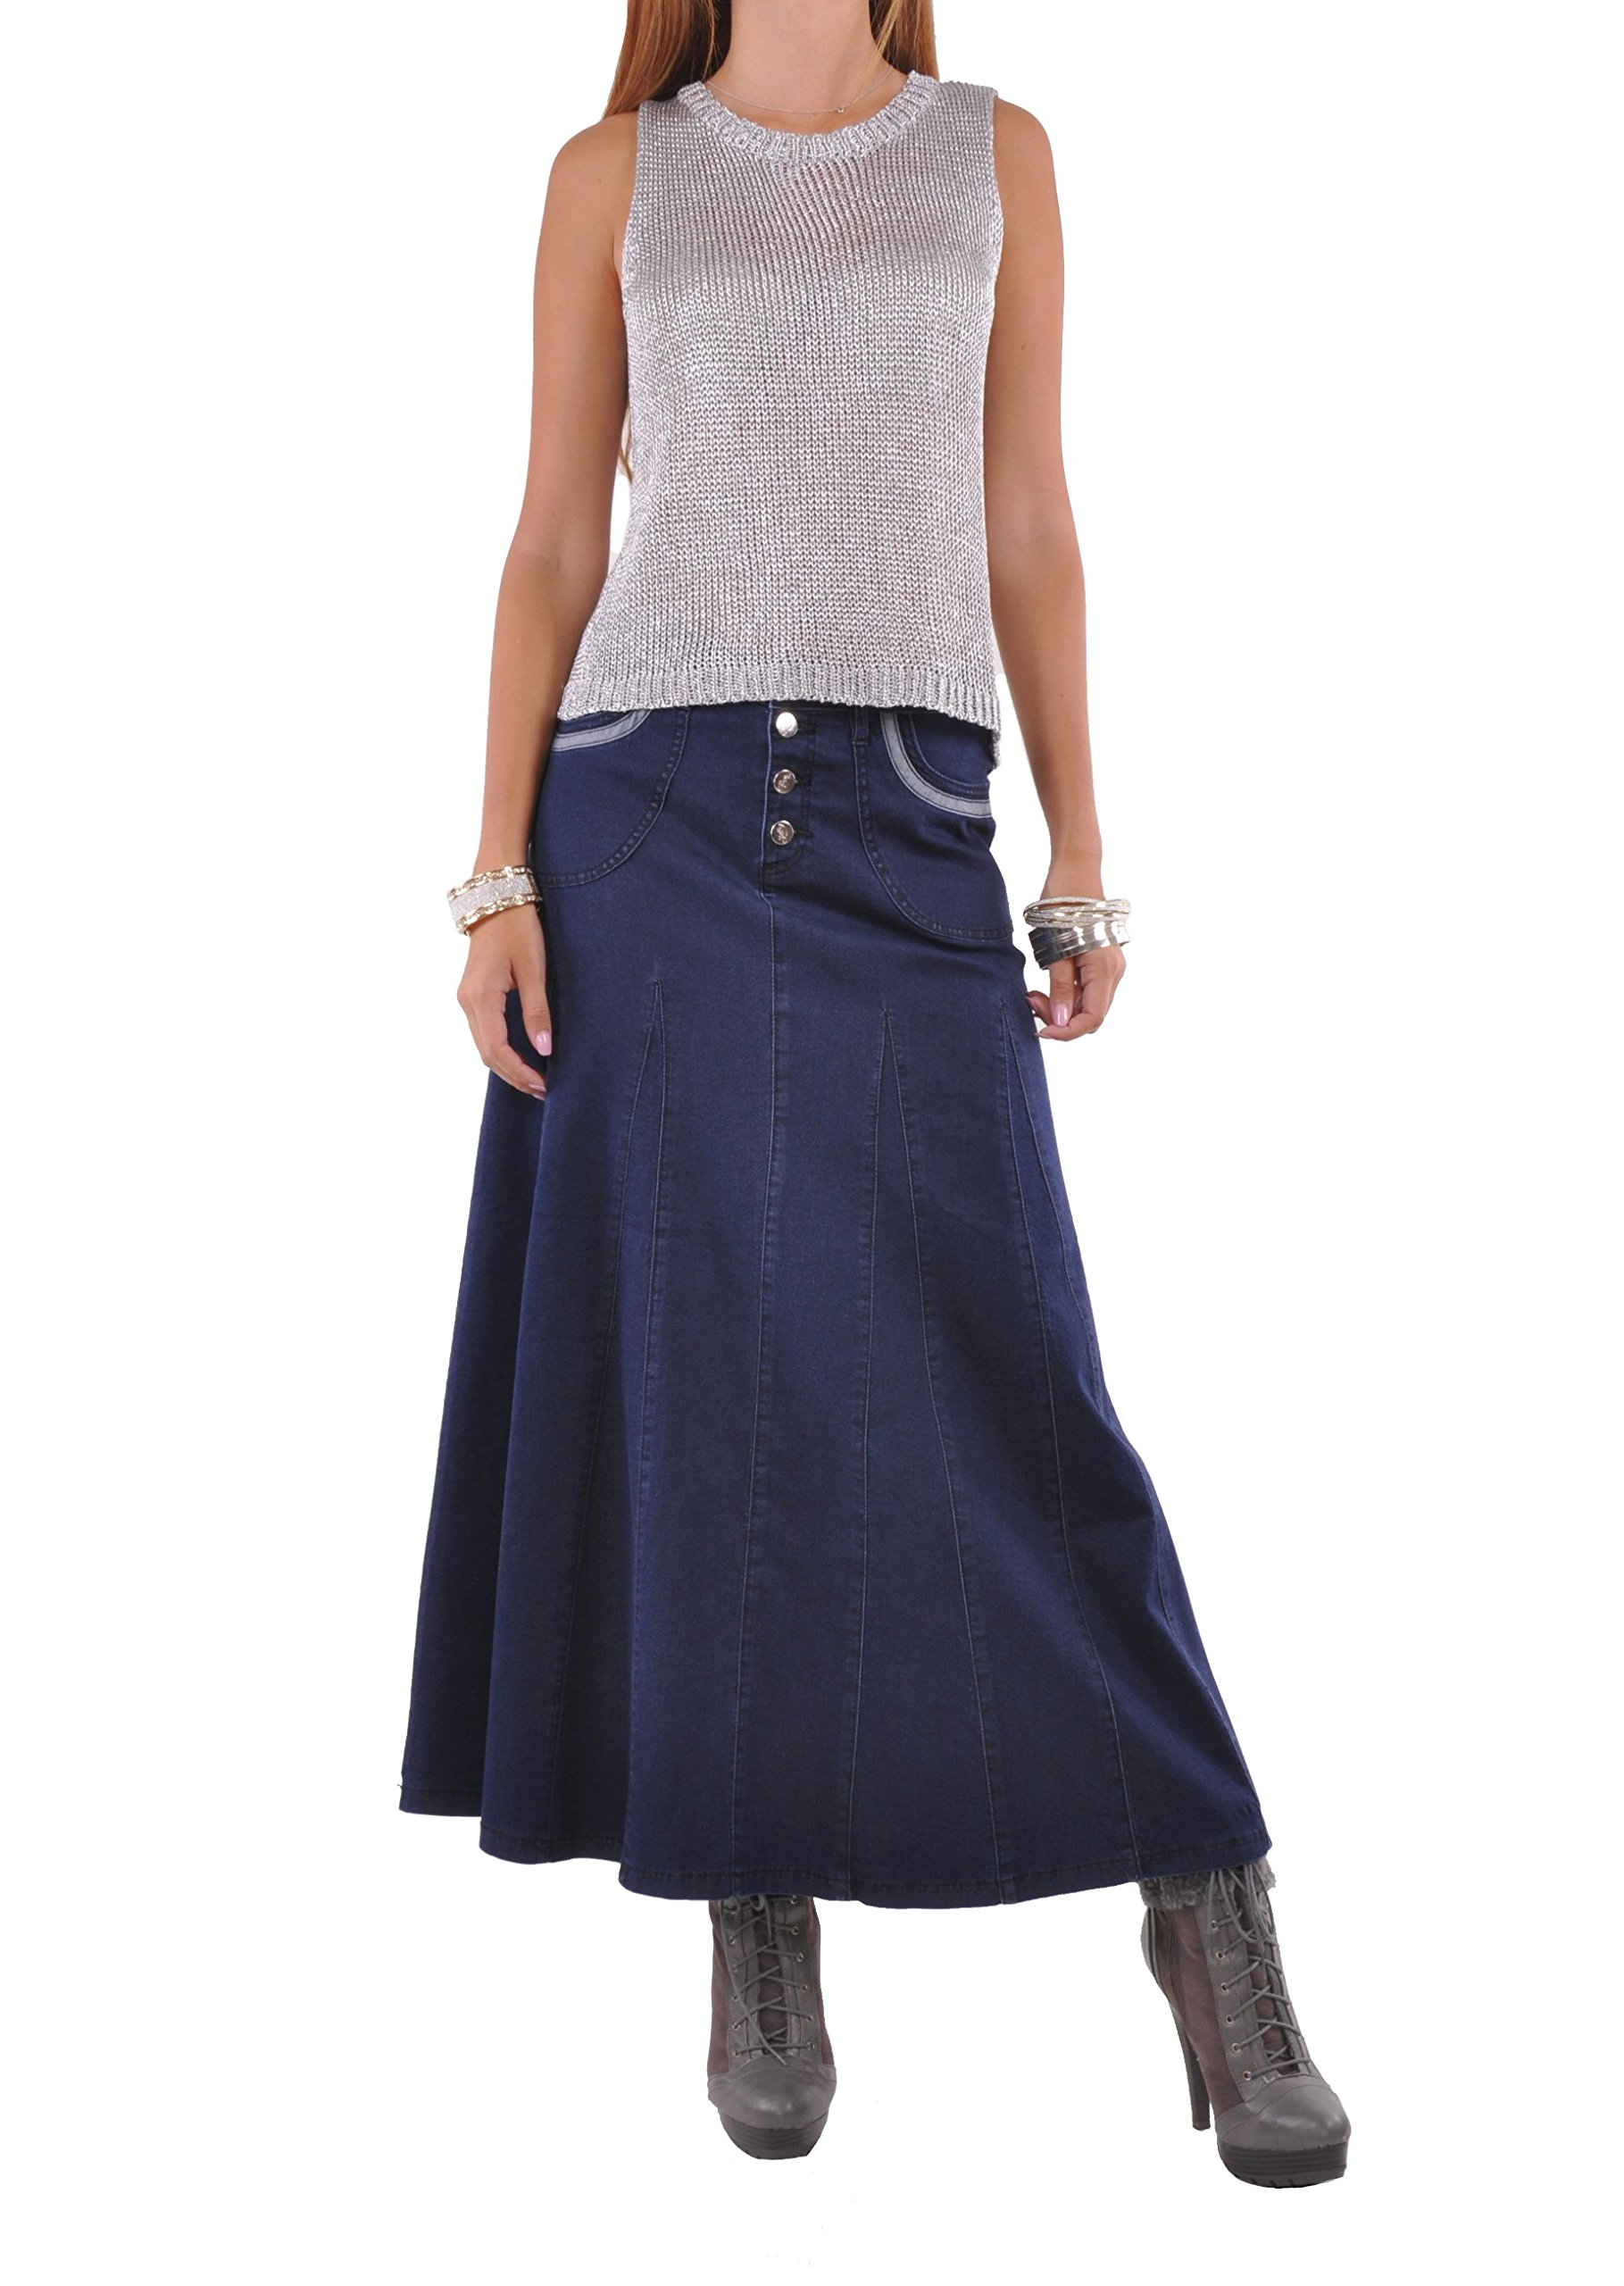 Style J Effortless Beauty Denim Skirt-Blue-30(10)